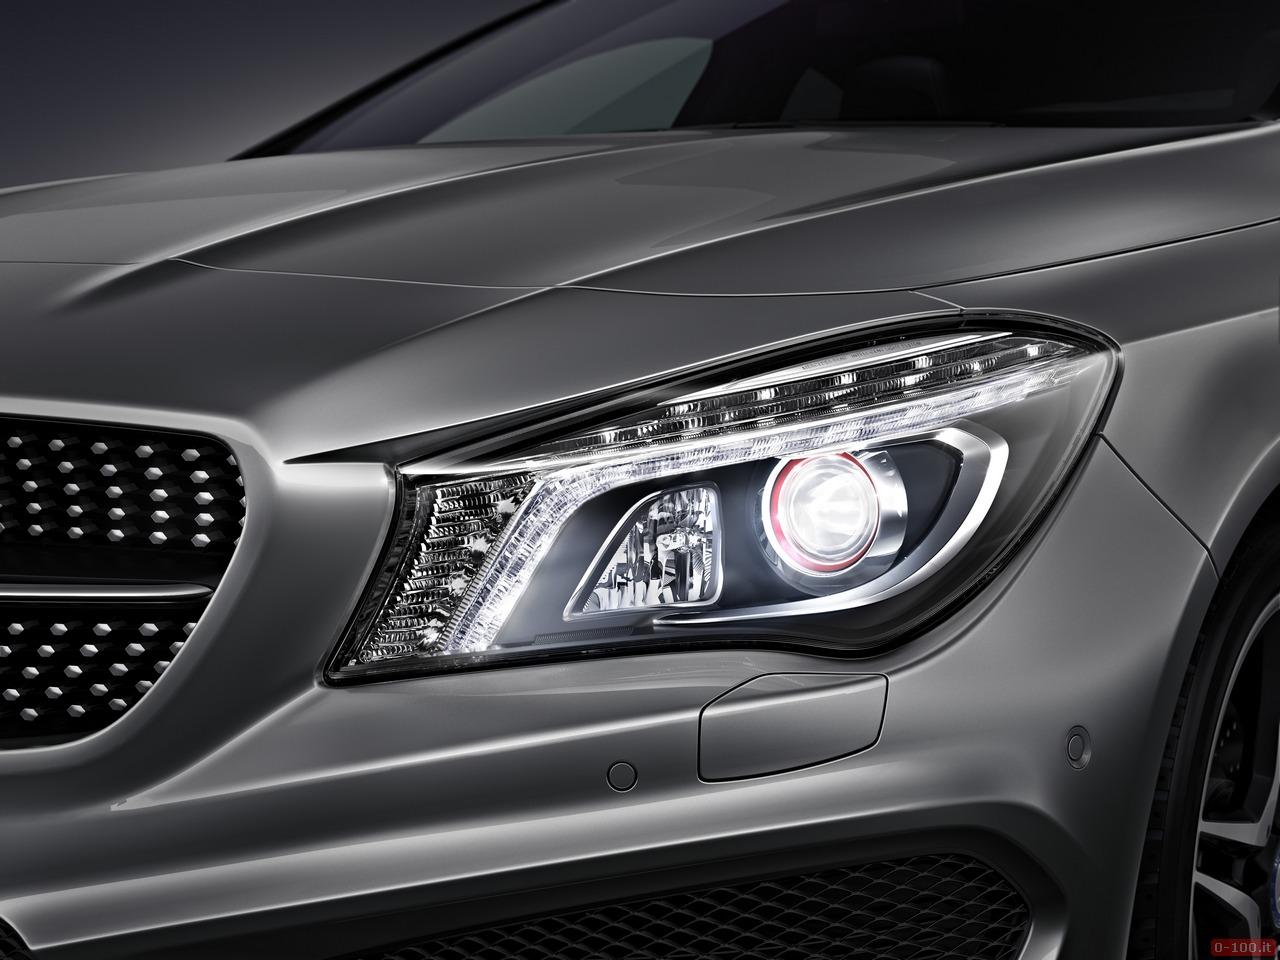 Mercedes-Benz CLA Intelligent Light System 2013